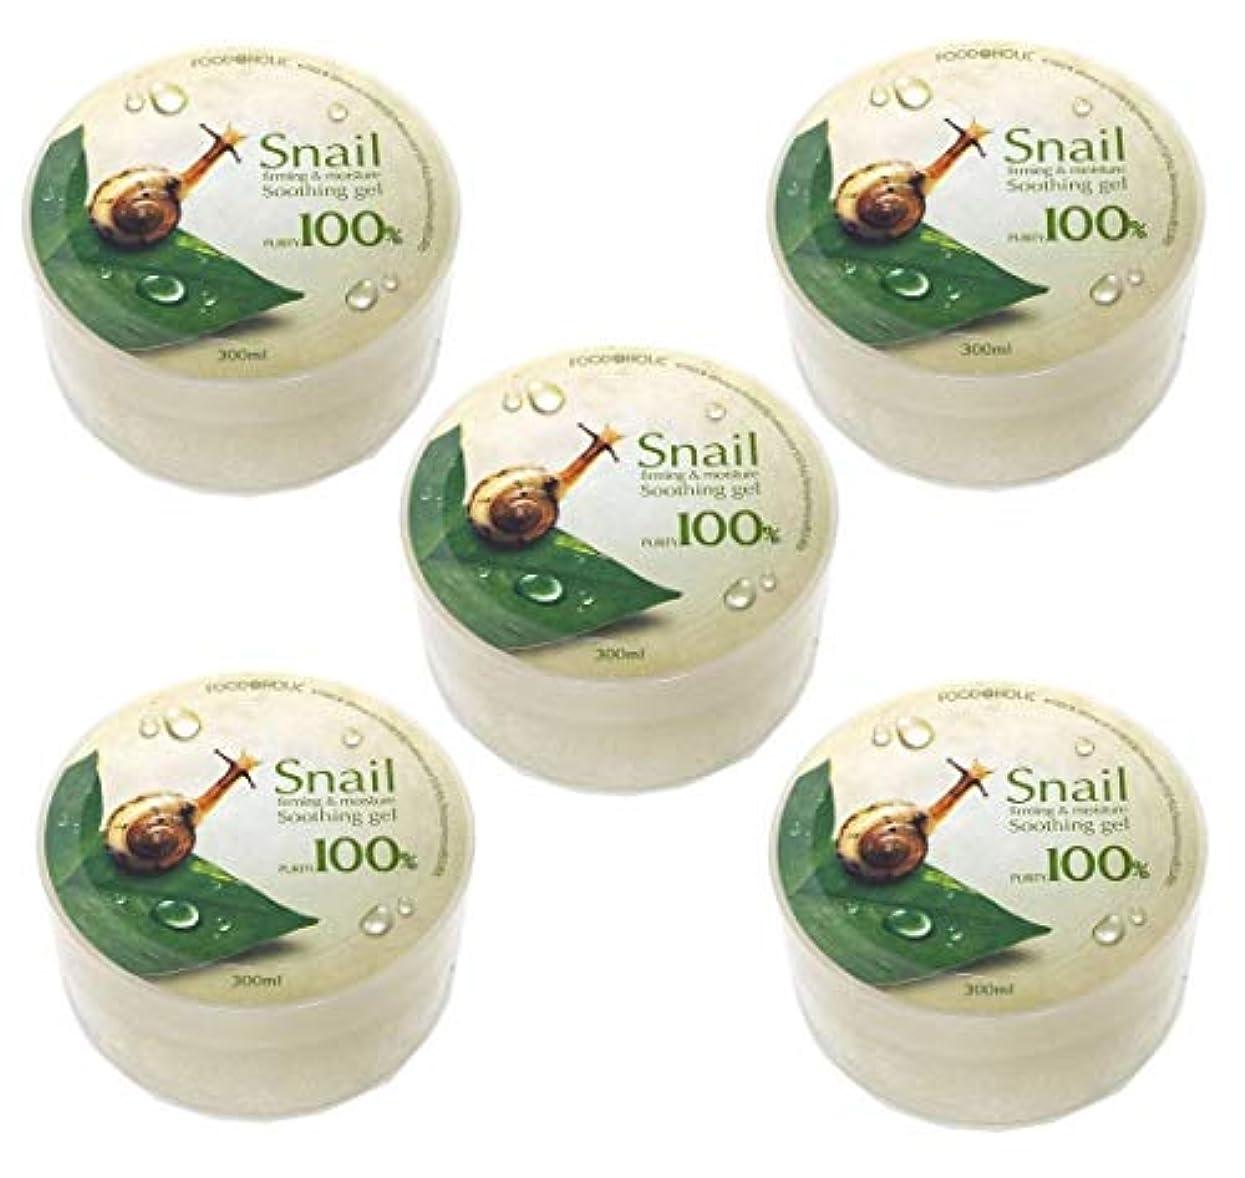 [Food A Holic] スネイルファーミング&水分スージングジェル300ml X 5ea / Snail Firming & moisture Soothing Gel 300ml X 5ea / 純度97% /...